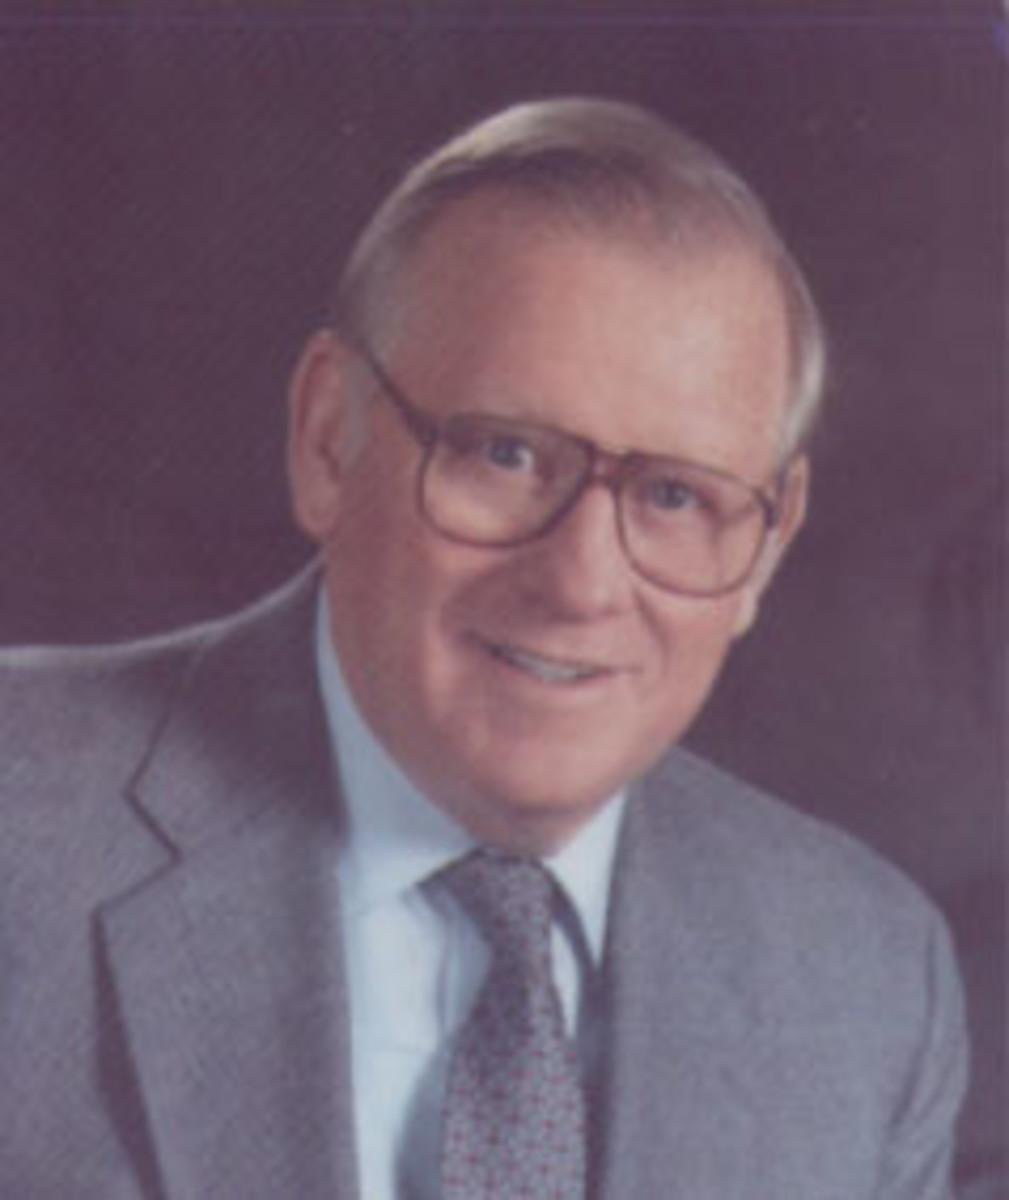 Dr. Joseph L. Joe Kearney (April 28, 1927  May 5, 2010) - cancer deaths